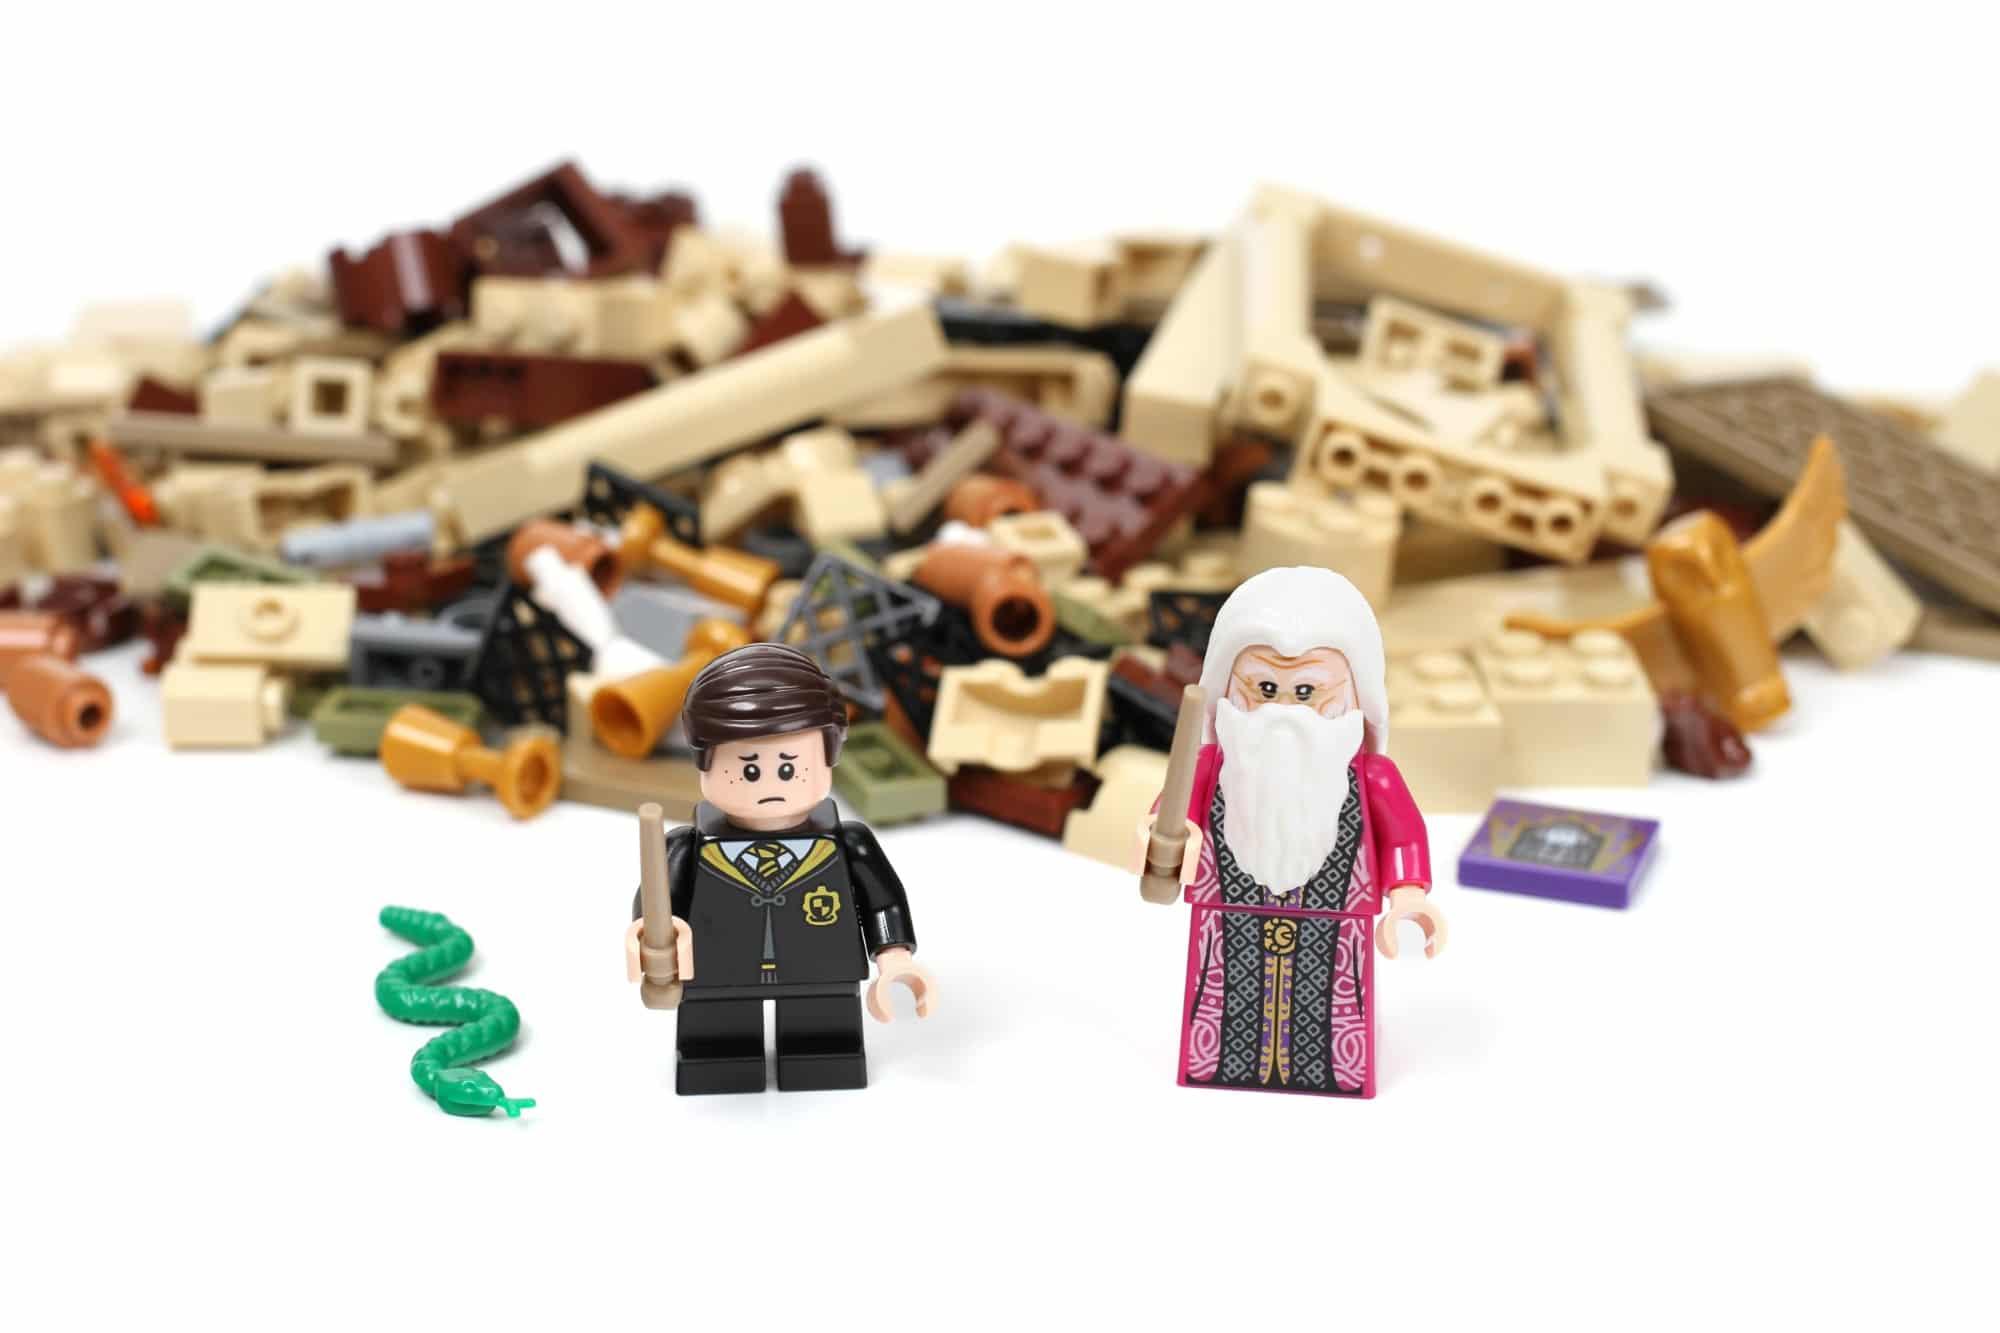 LEGO Harry Potter 76389 Hogwarts Kammer Des Schreckens Schritt 4 1